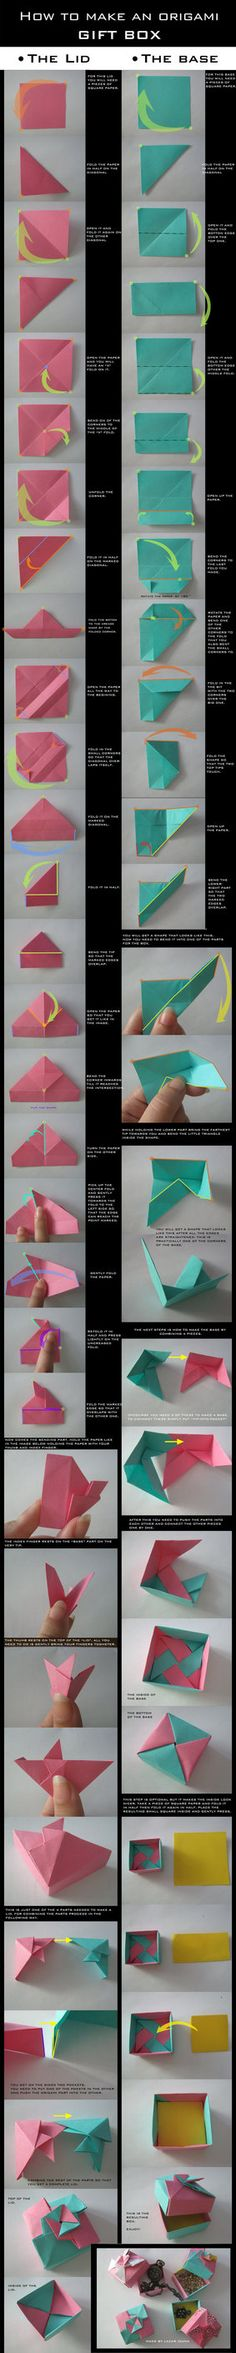 TUTORIAL: Origami Gift Box by ~DarkUmah on deviantART